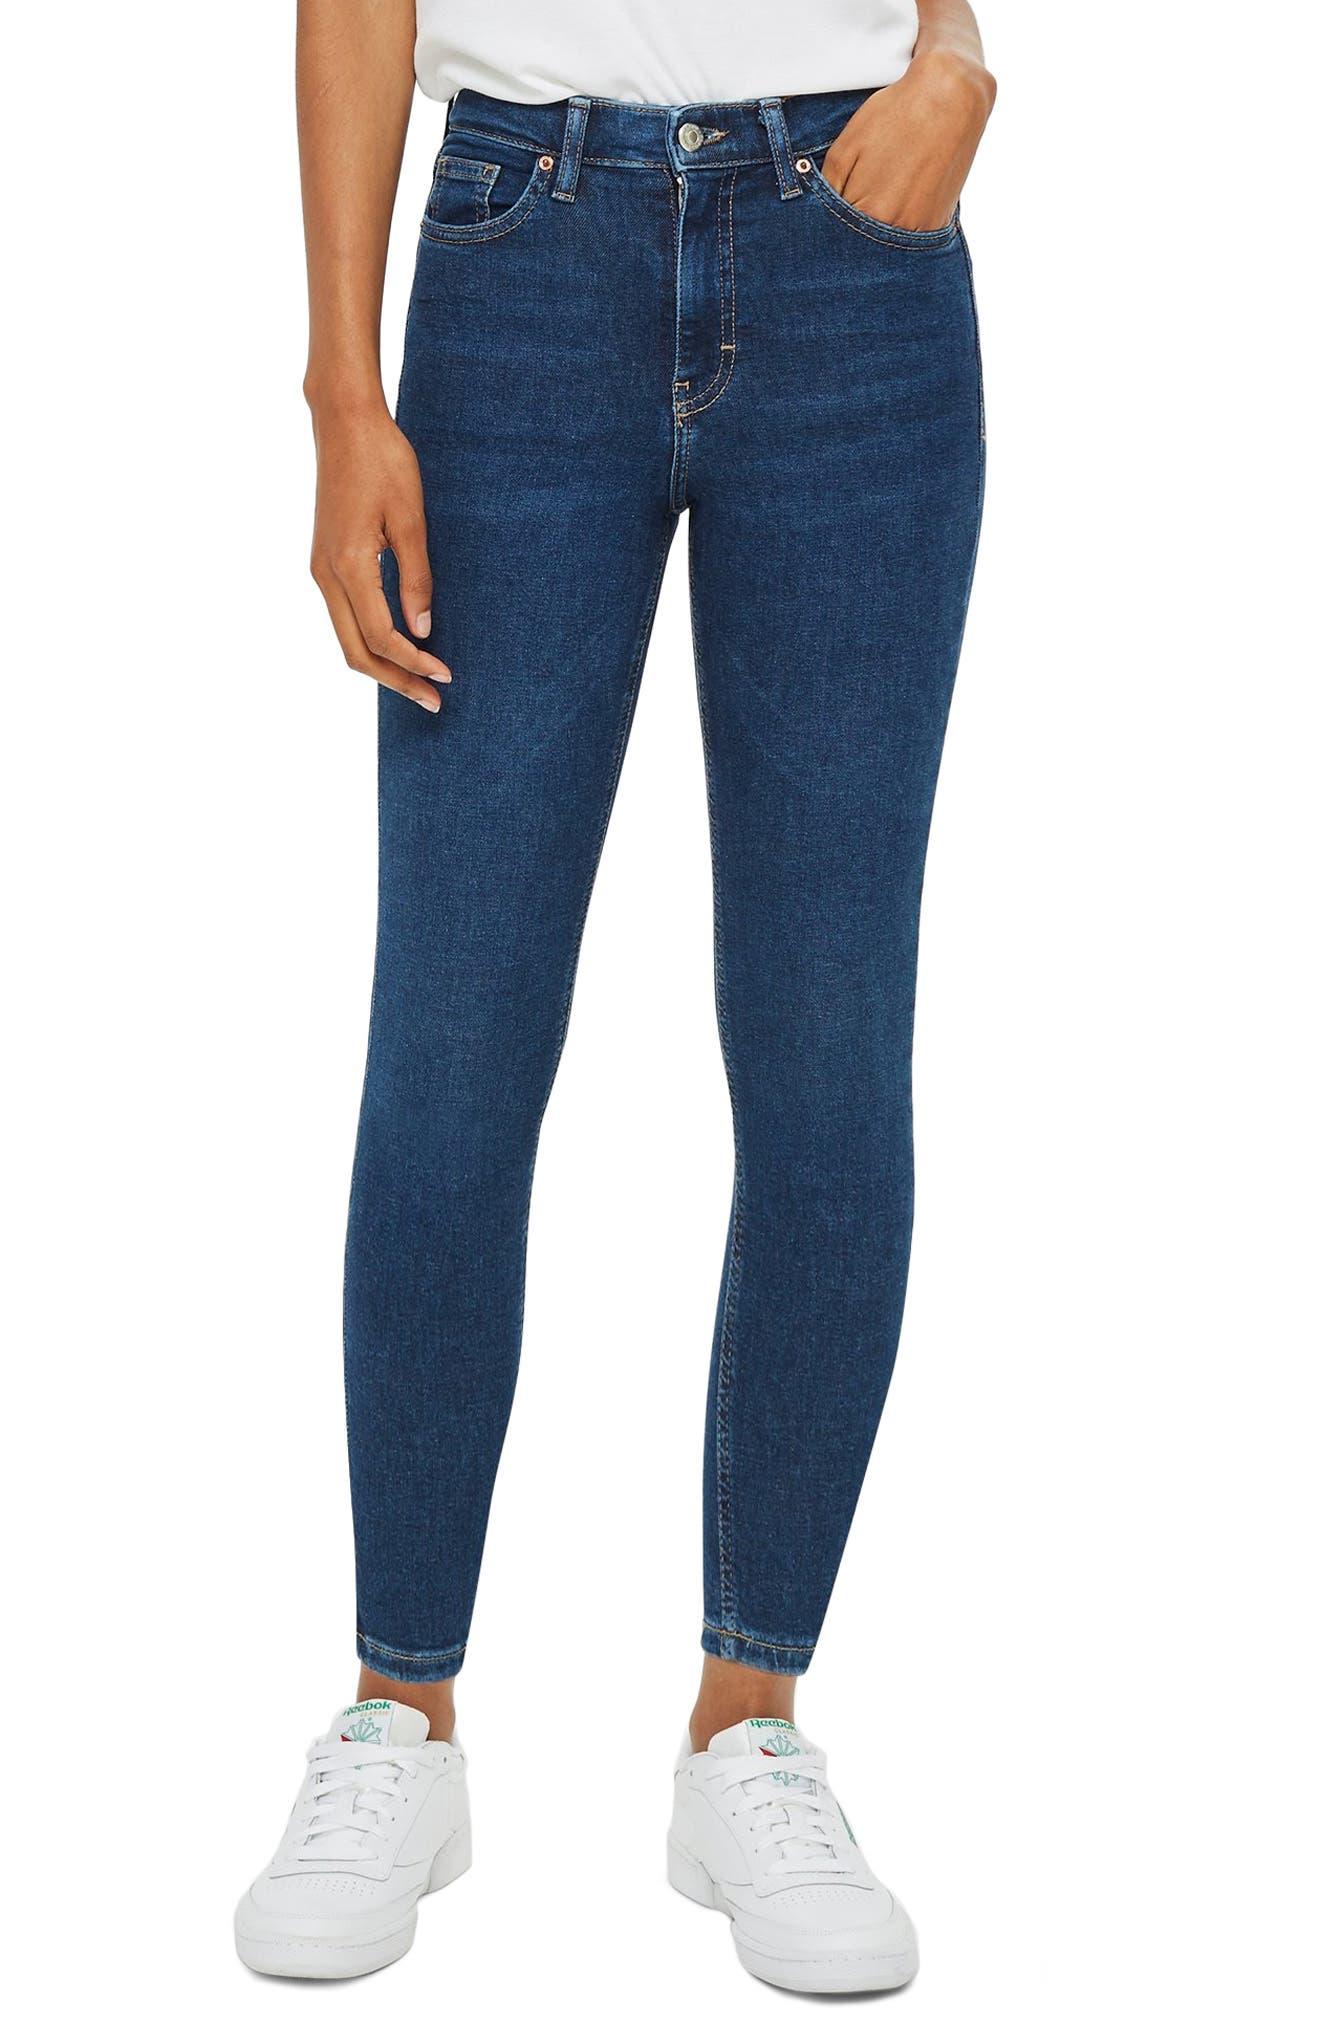 TOPSHOP, Jamie Skinny Jeans, Main thumbnail 1, color, INDIGO